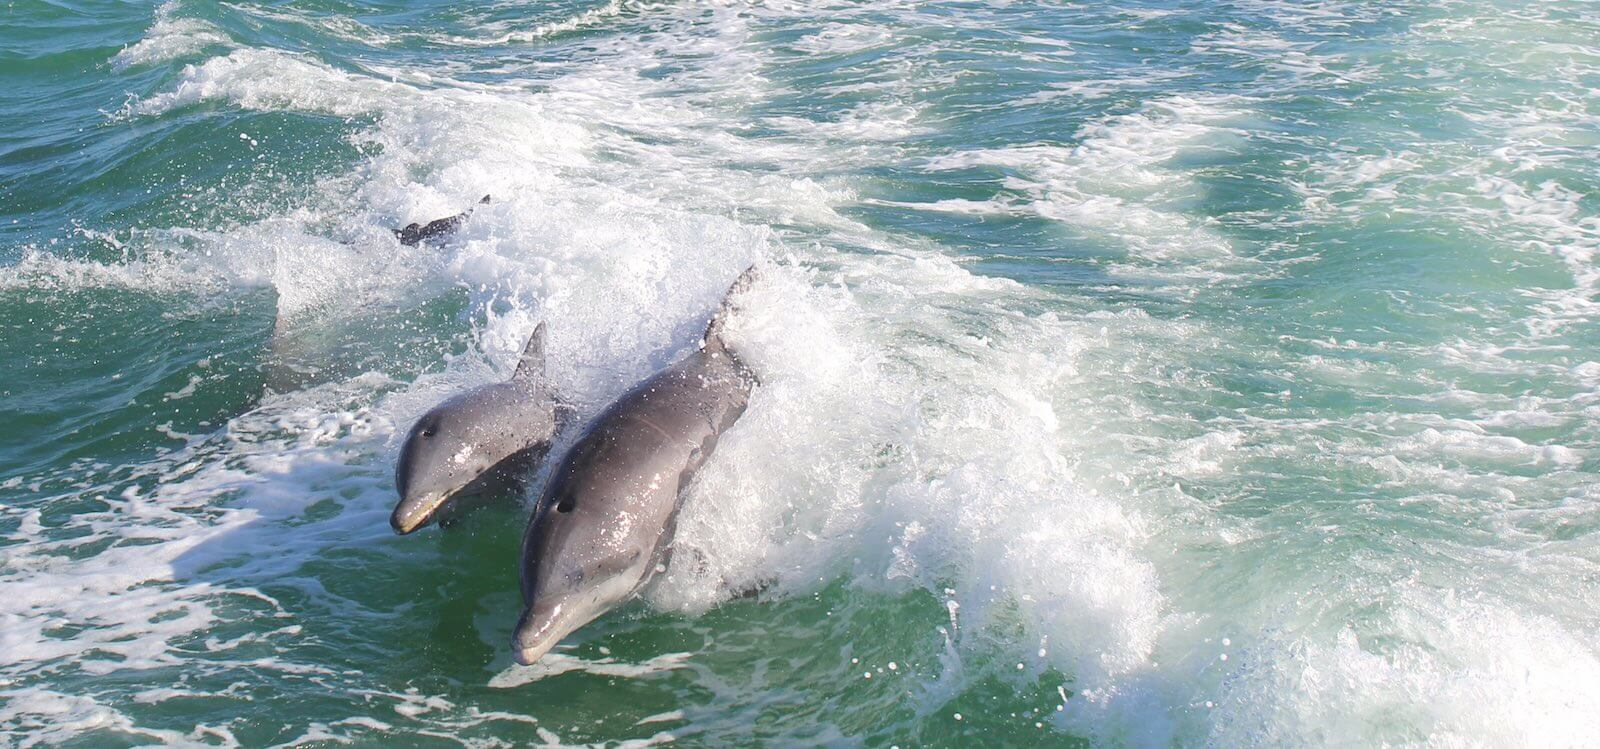 MustDo.com | Family fun dolphin sightseeing cruises Fort Myers, Sanibel and Captiva Island, Florida.